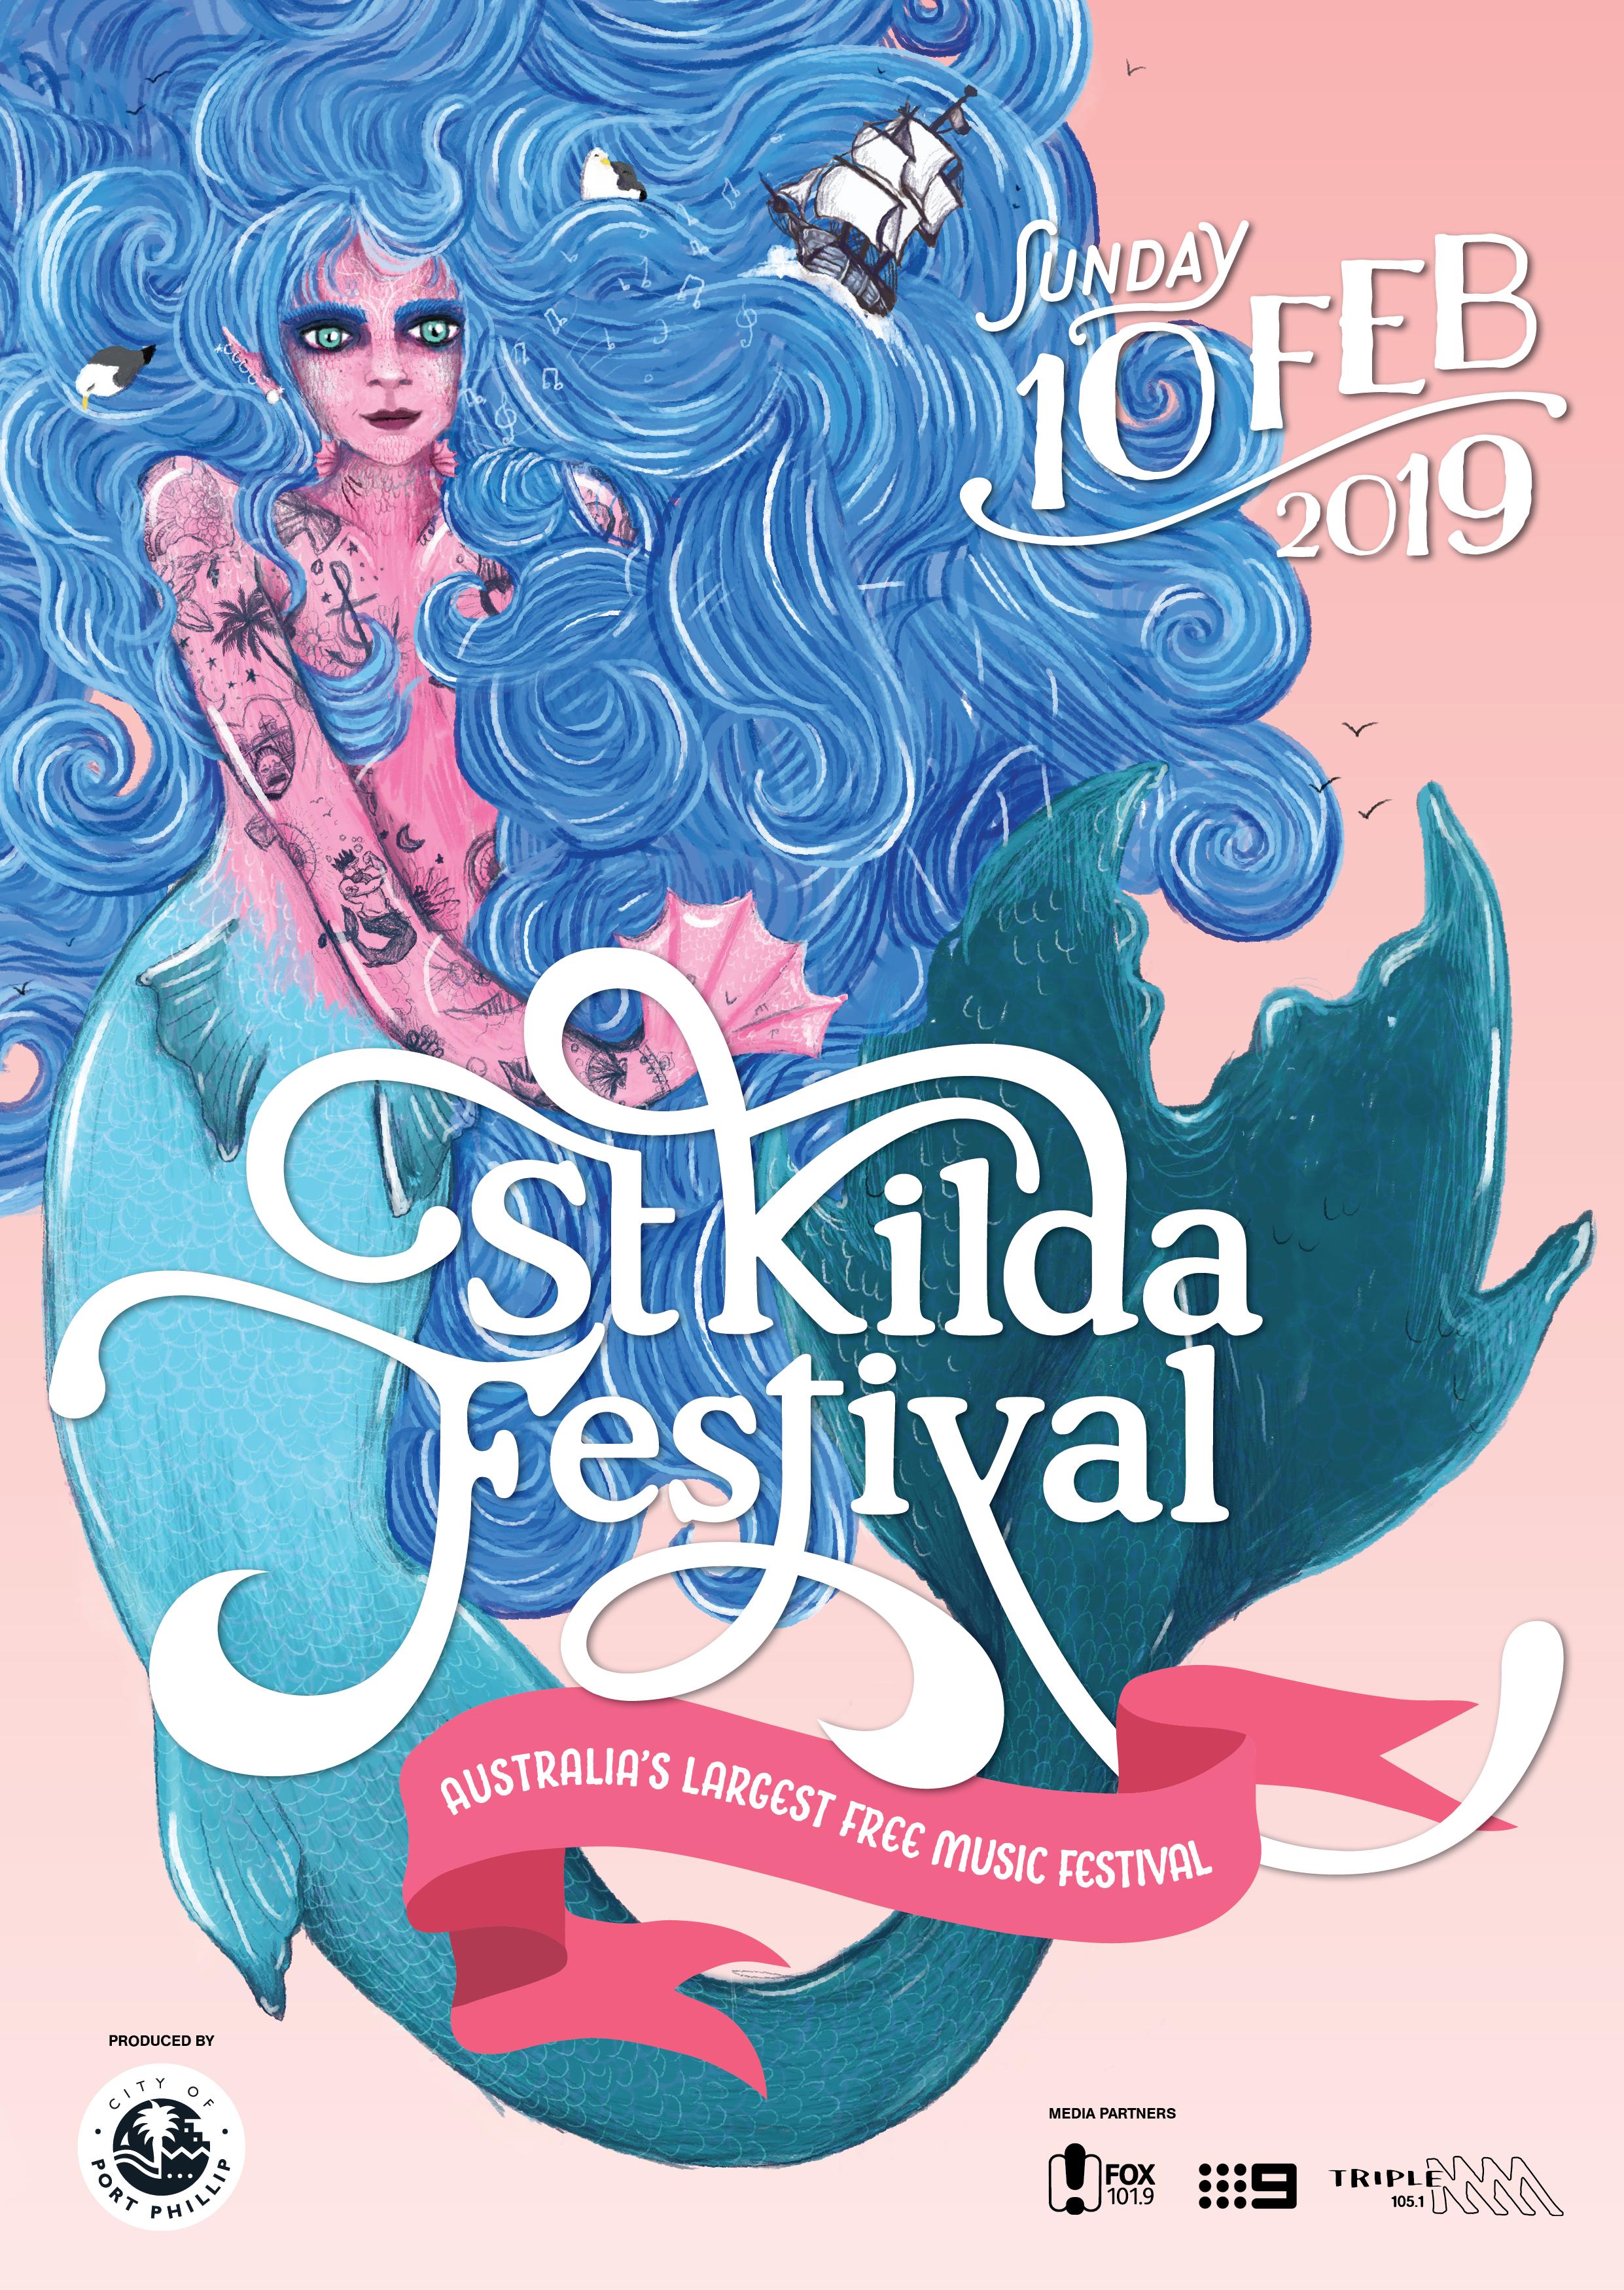 St Kilda Festival 2019 POSTER-01.png